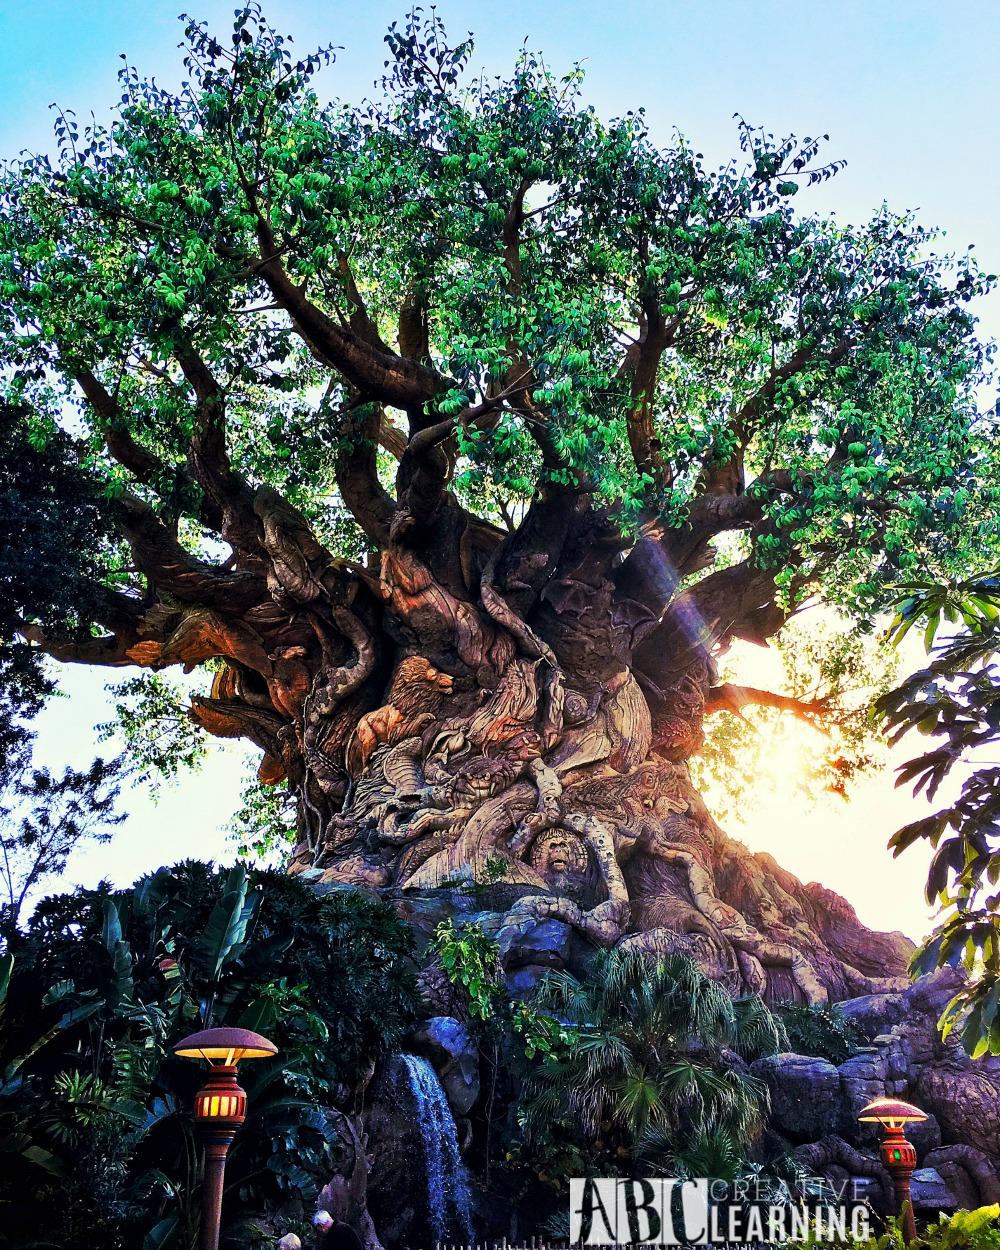 7 Reasons To Visit Disney's Animal Kingdom Theme Park